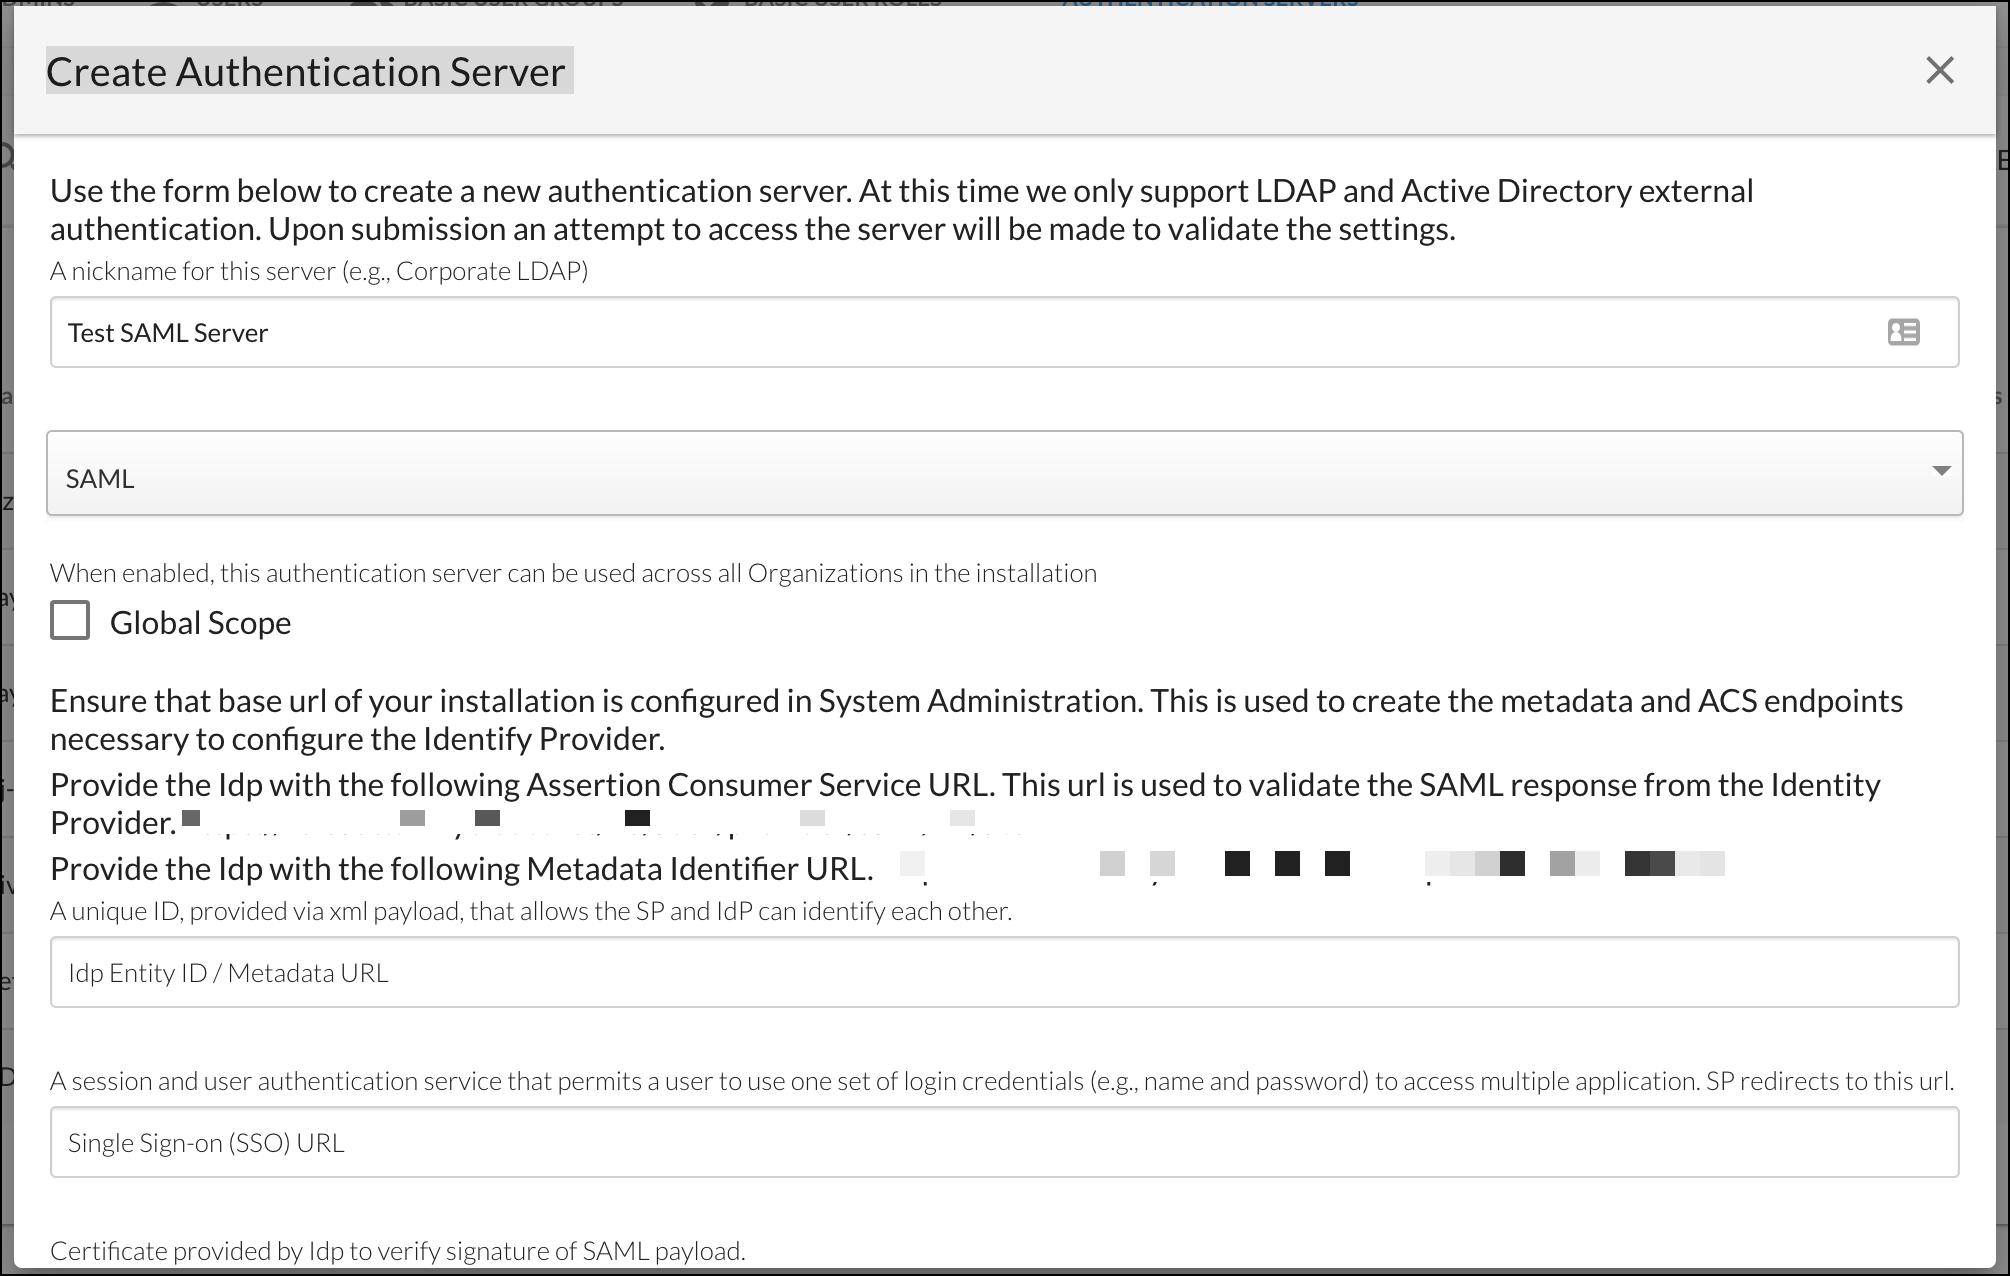 Create Authentication Server - SAML Example